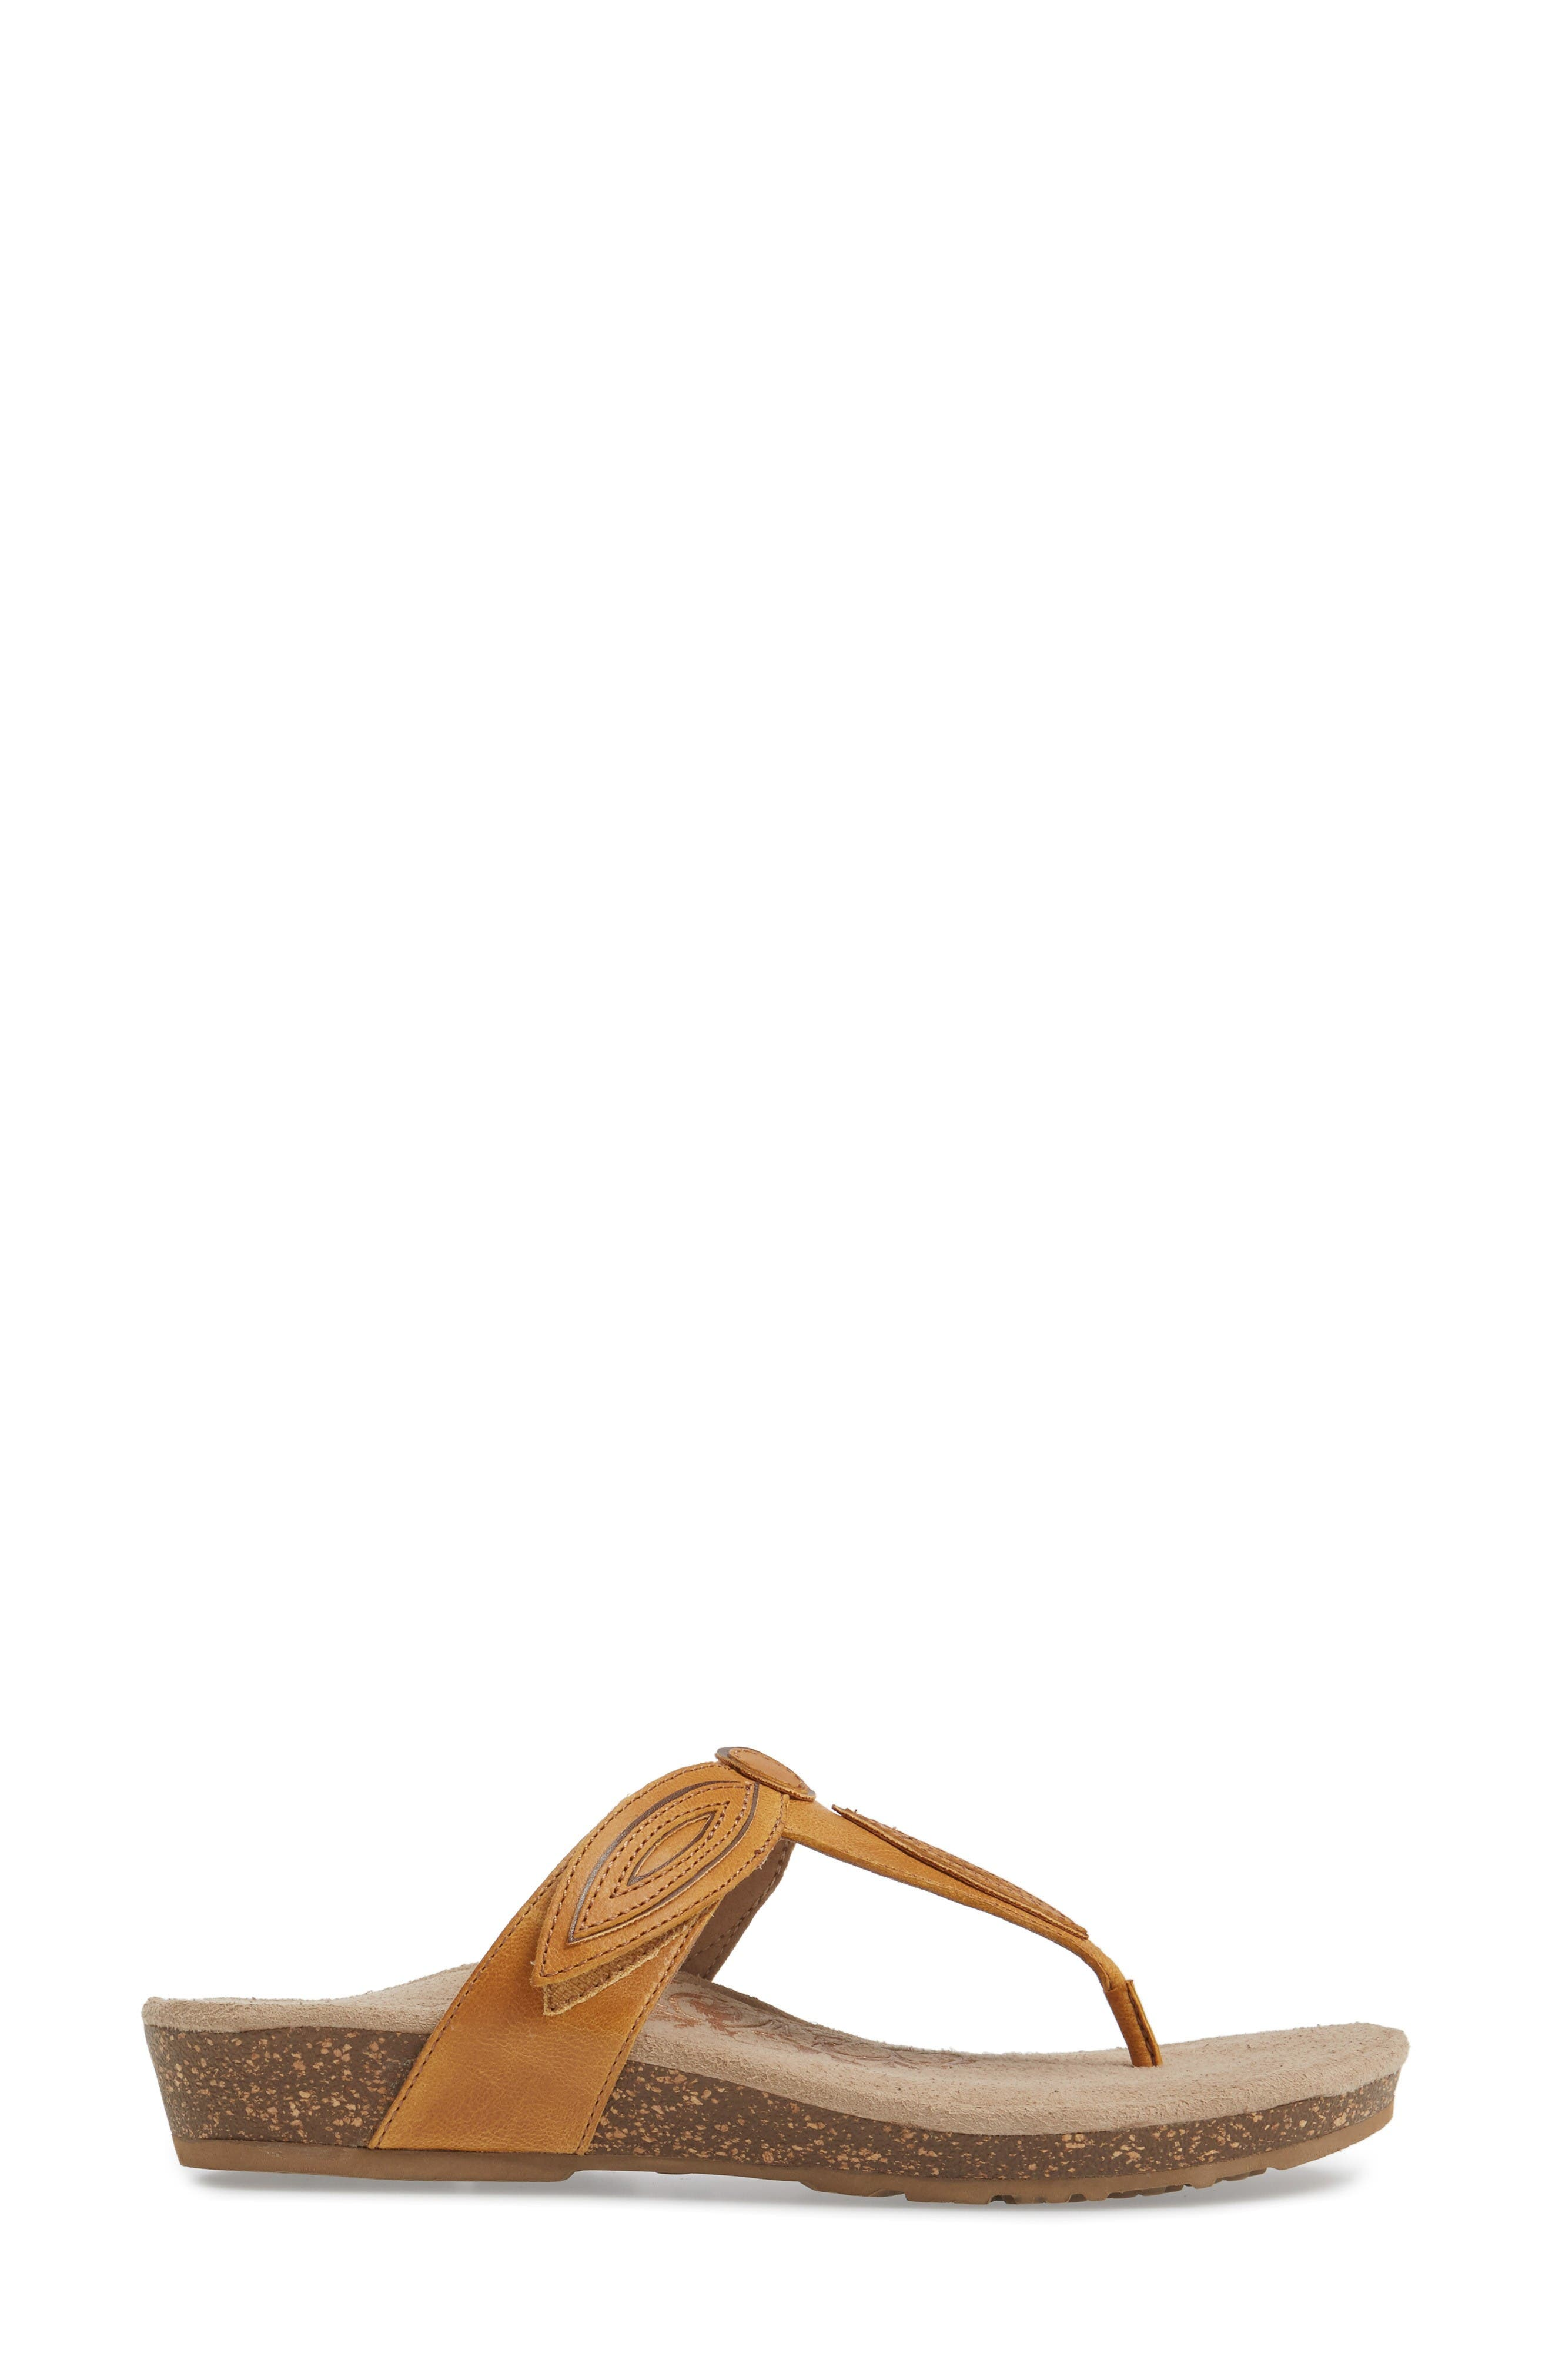 'Terri' Flip Flop,                             Alternate thumbnail 3, color,                             Mustard Leather